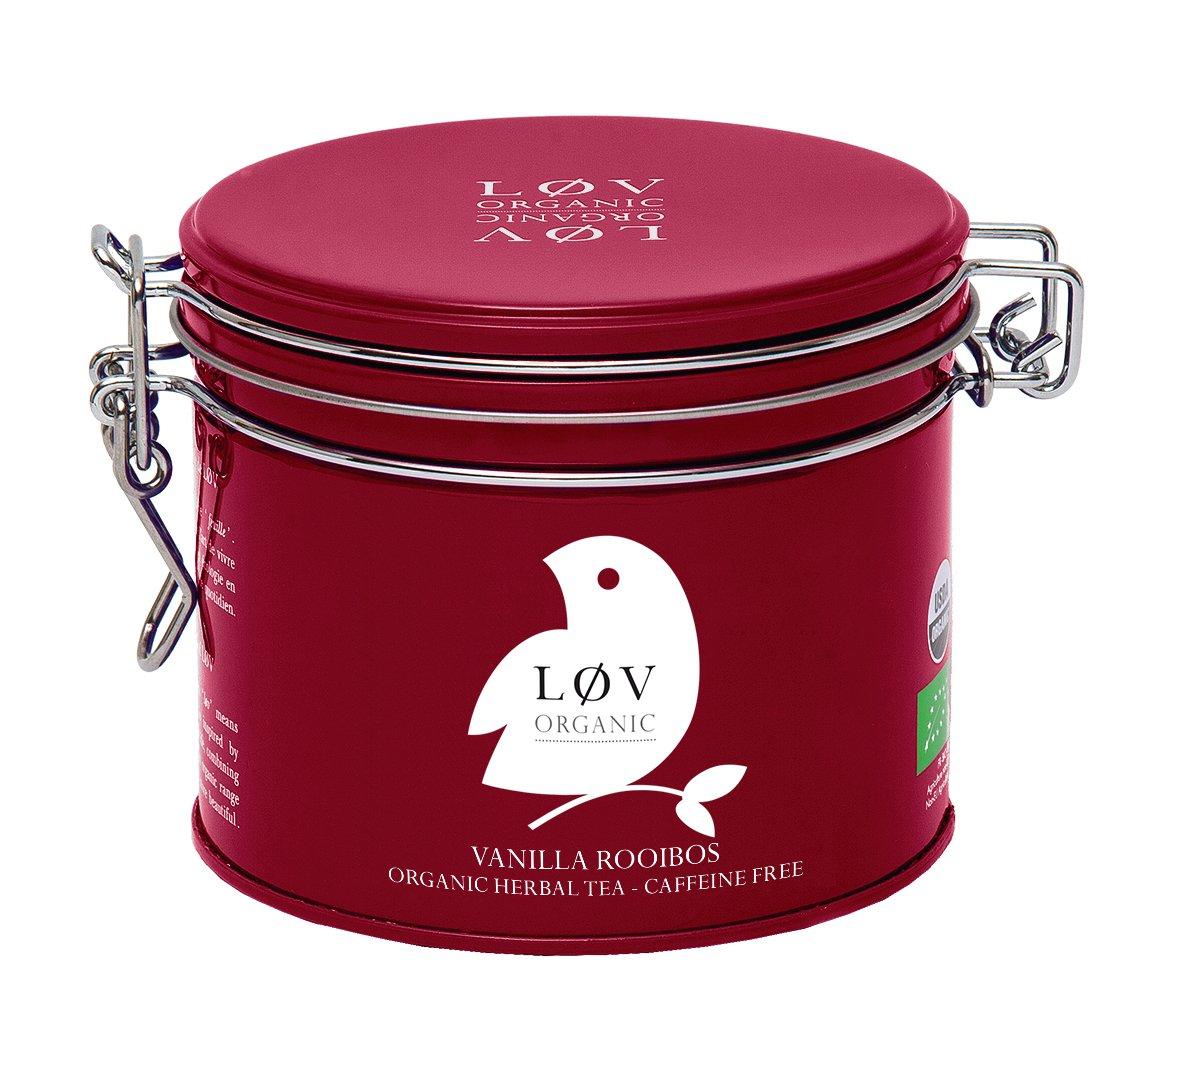 Løv Organic Vanilla Rooibos Tea - Rooibos and Vanilla Organic Blend Calming Caffeine Free Herbal Tea (3.5oz Loose Tea Tin - 40 Servings)